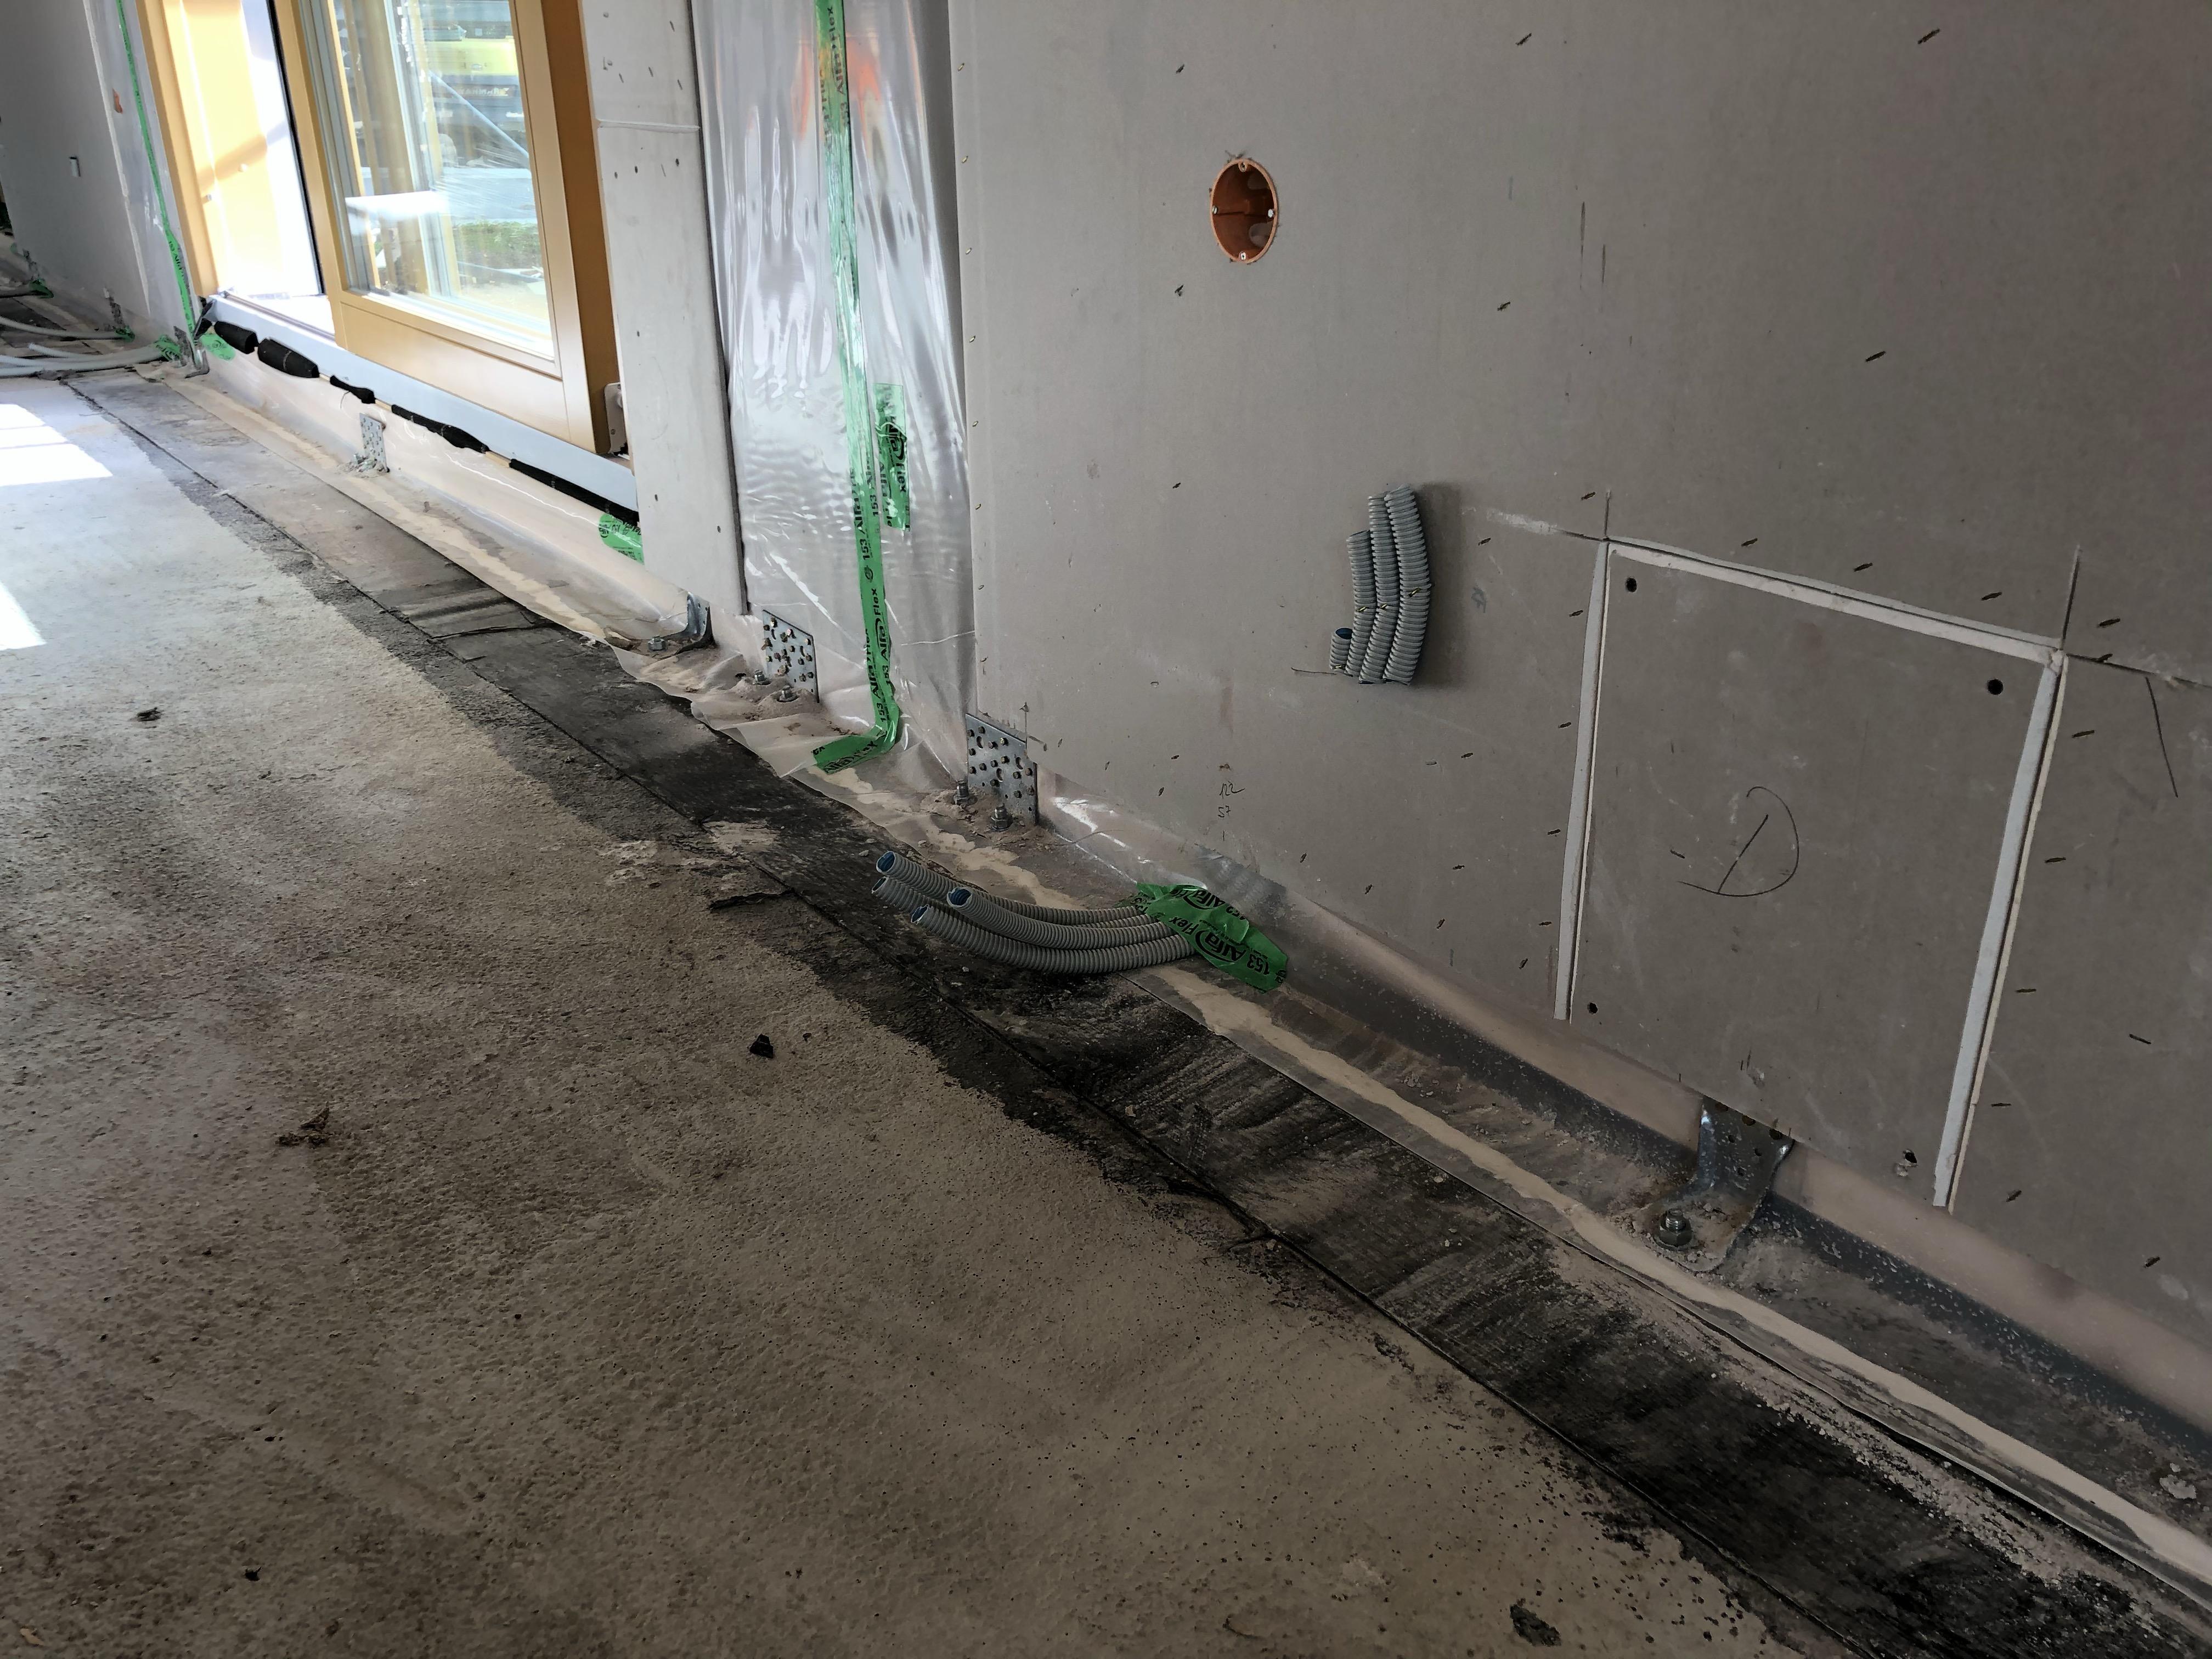 Dettaglio parete appena posata e fissata